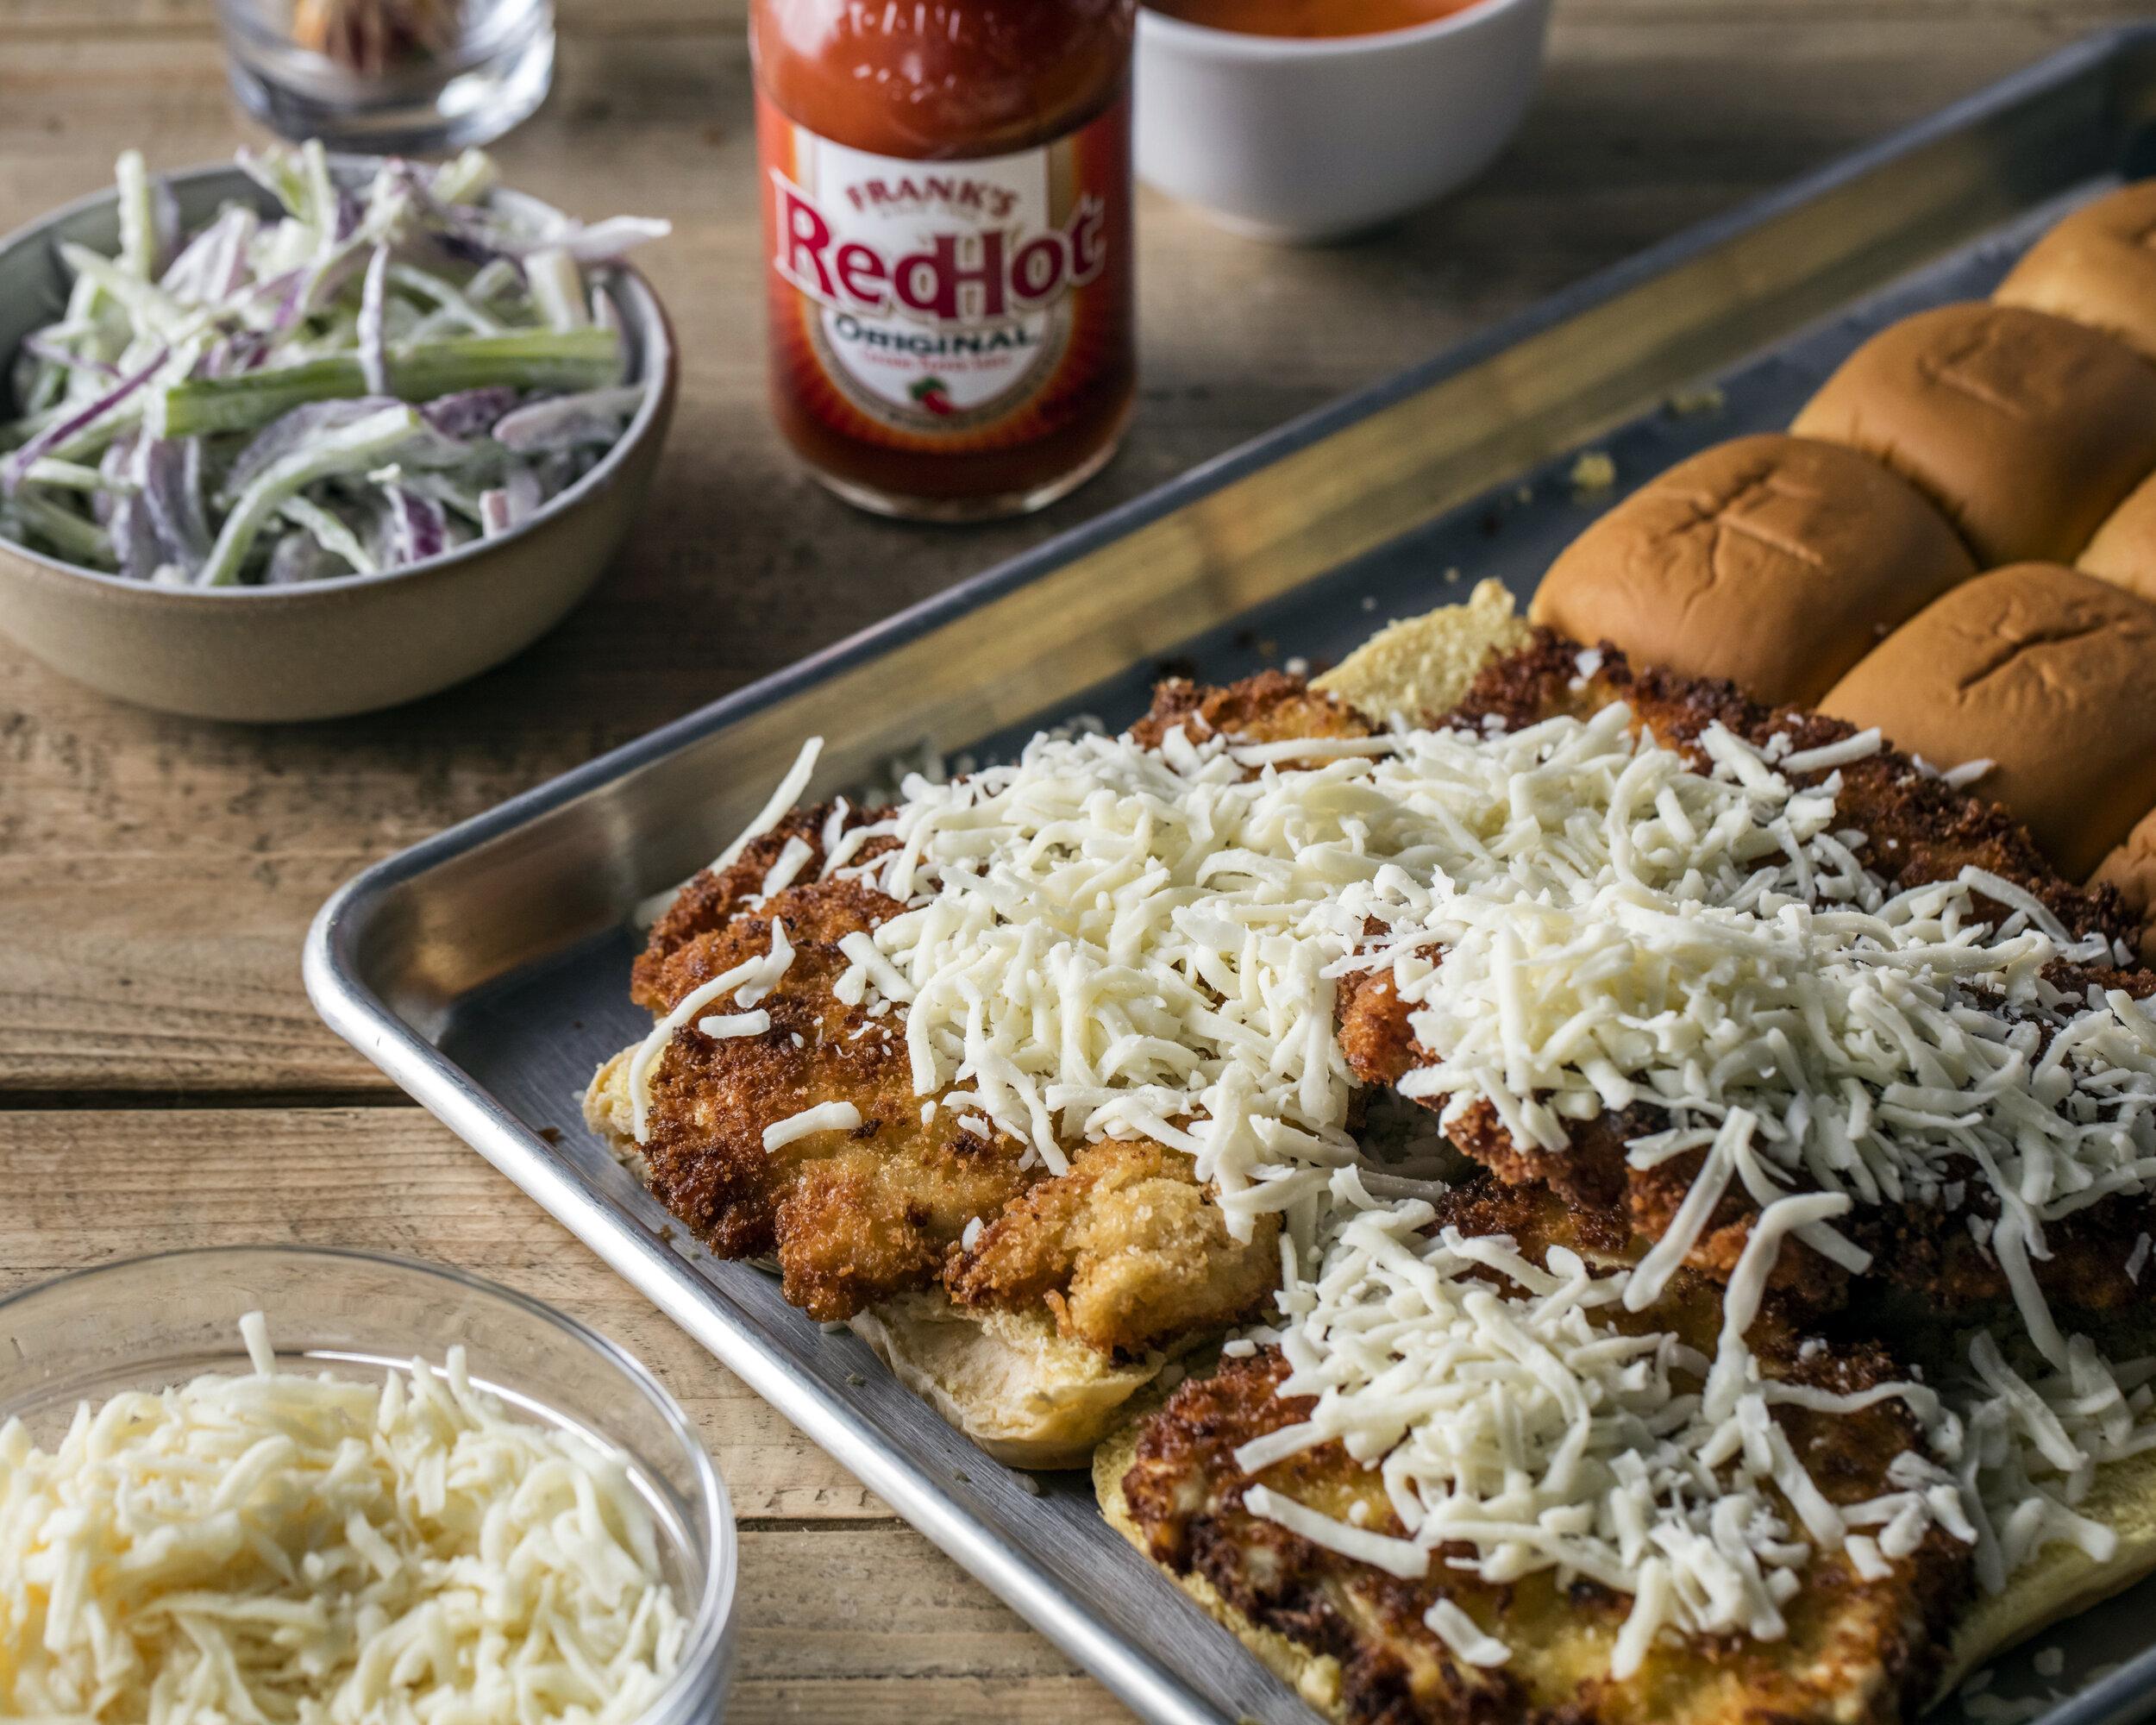 Franks RedHot Chicken Sandwich.Andrew Rea, Binging with Babish, Food stylist, Judy Kim Photographer, Eric Medsker